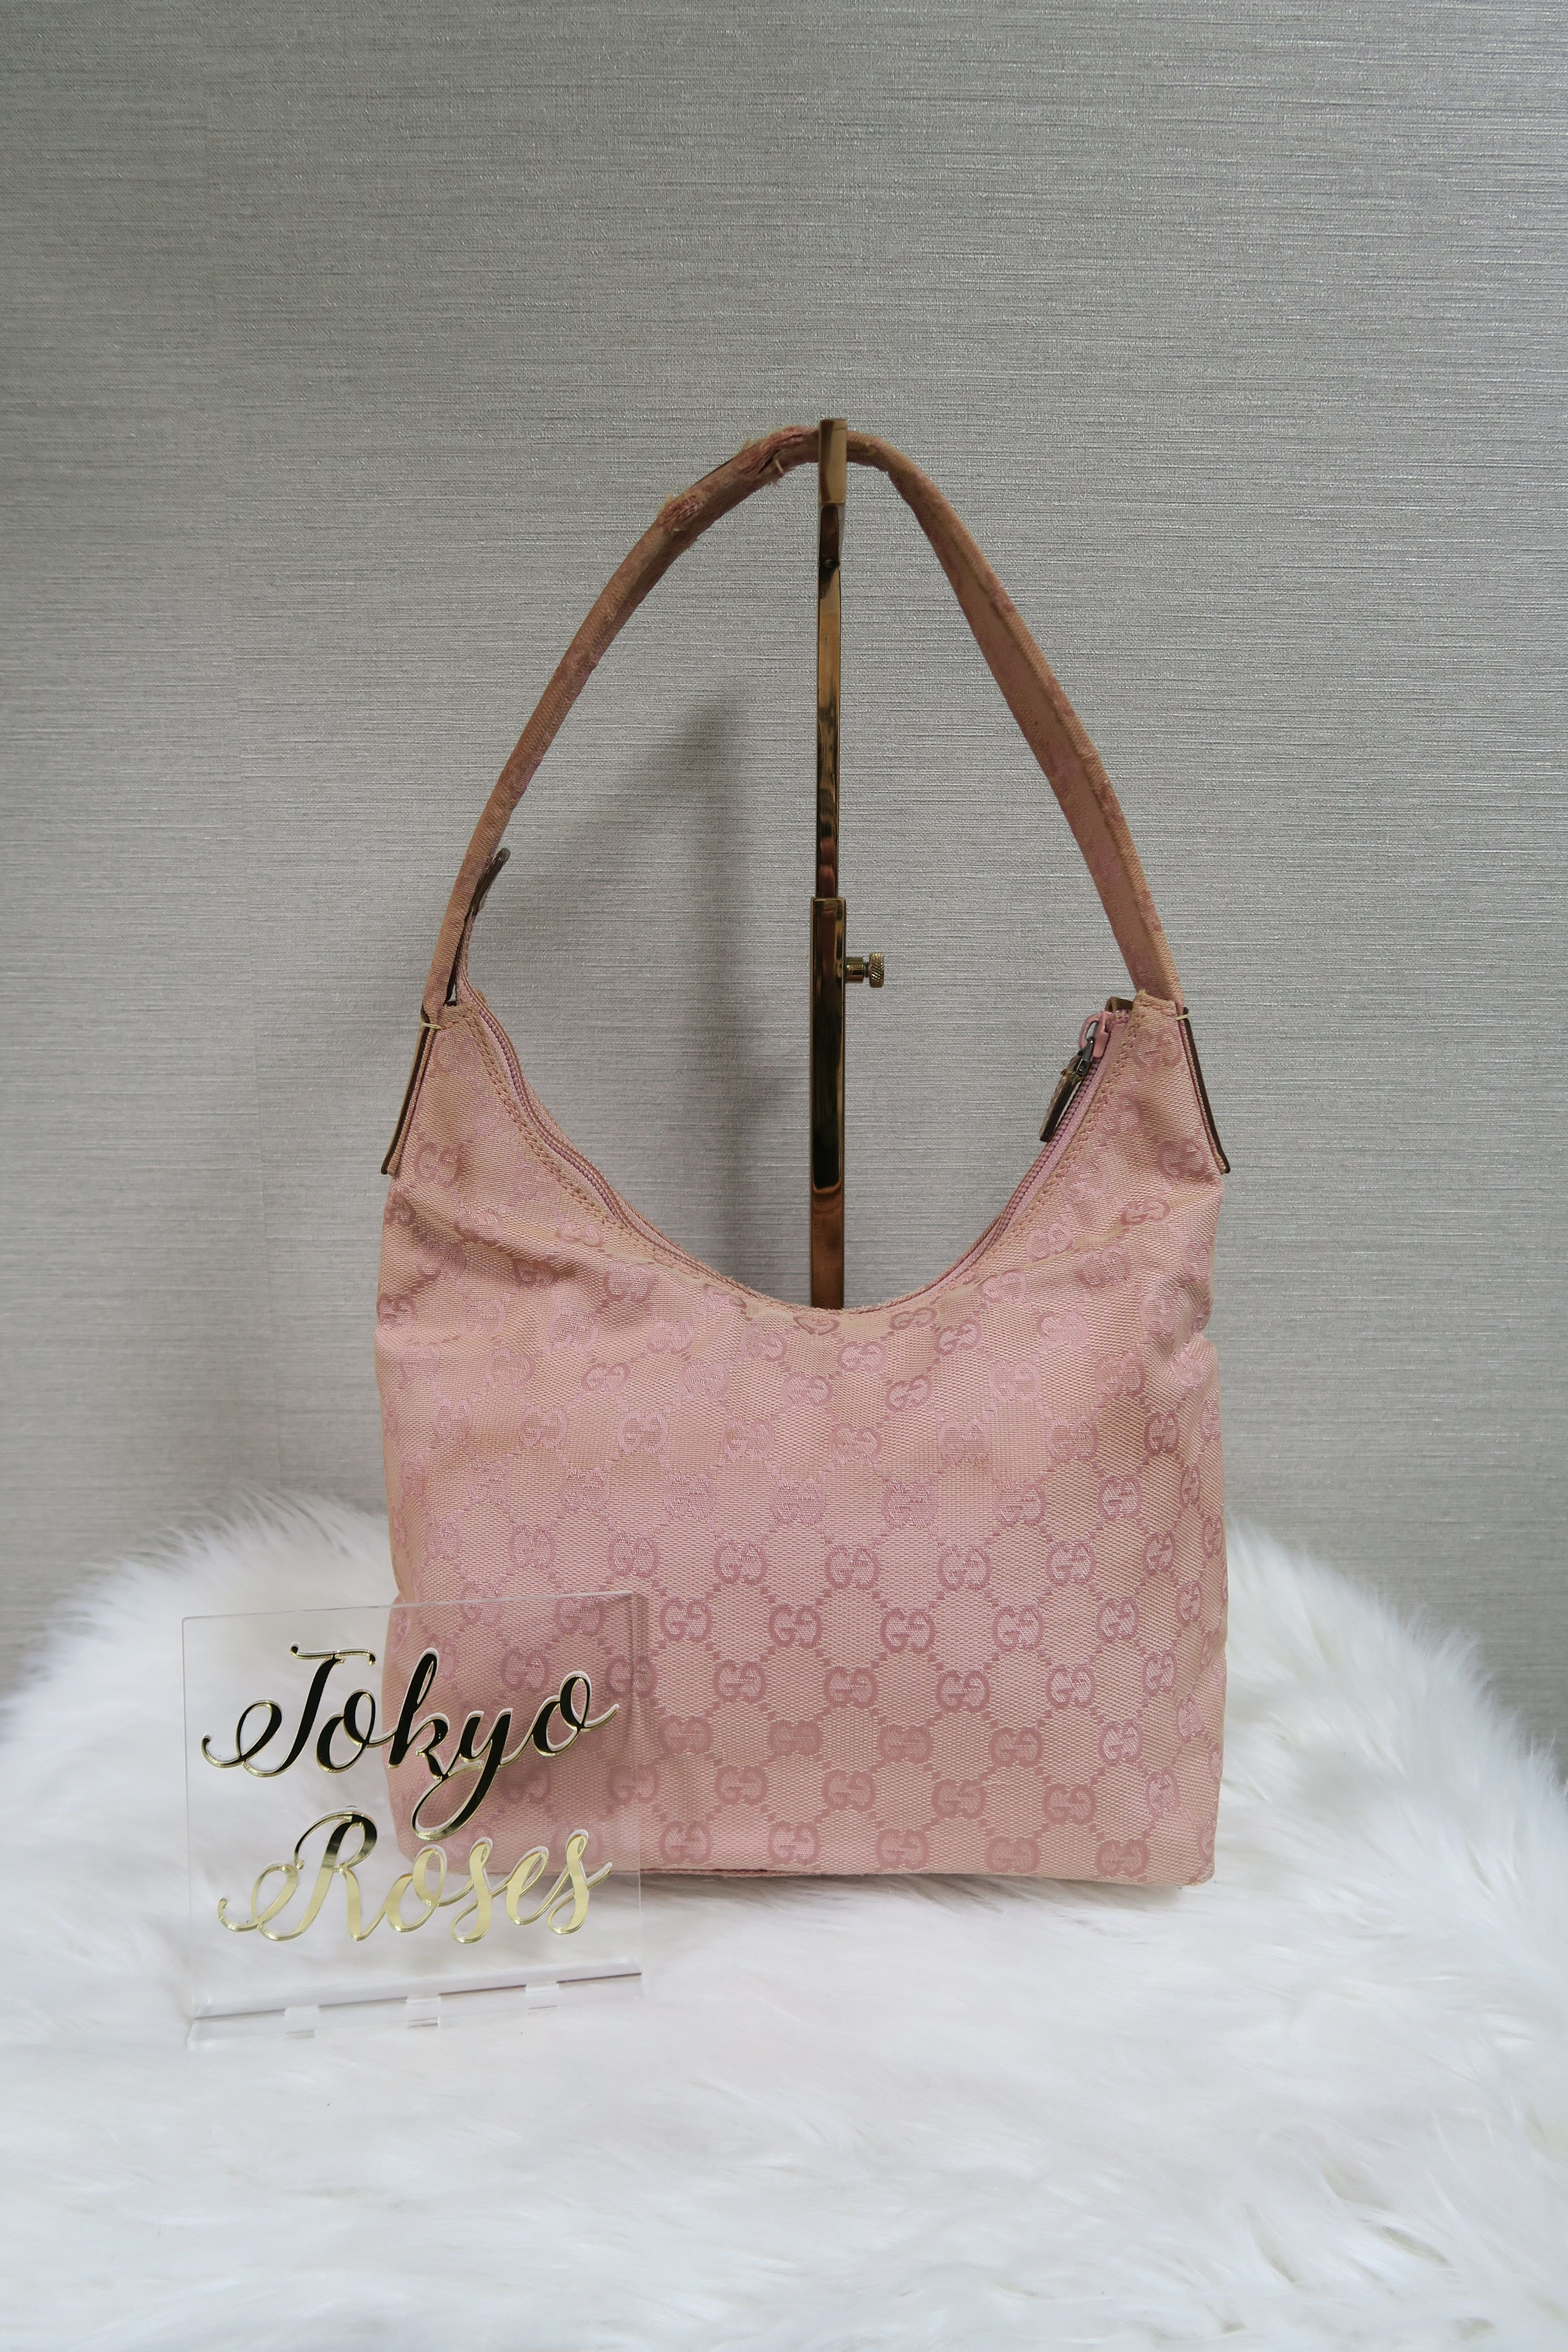 Pink Gucci GG Monogram Canvas Bag Beige Leather Strap